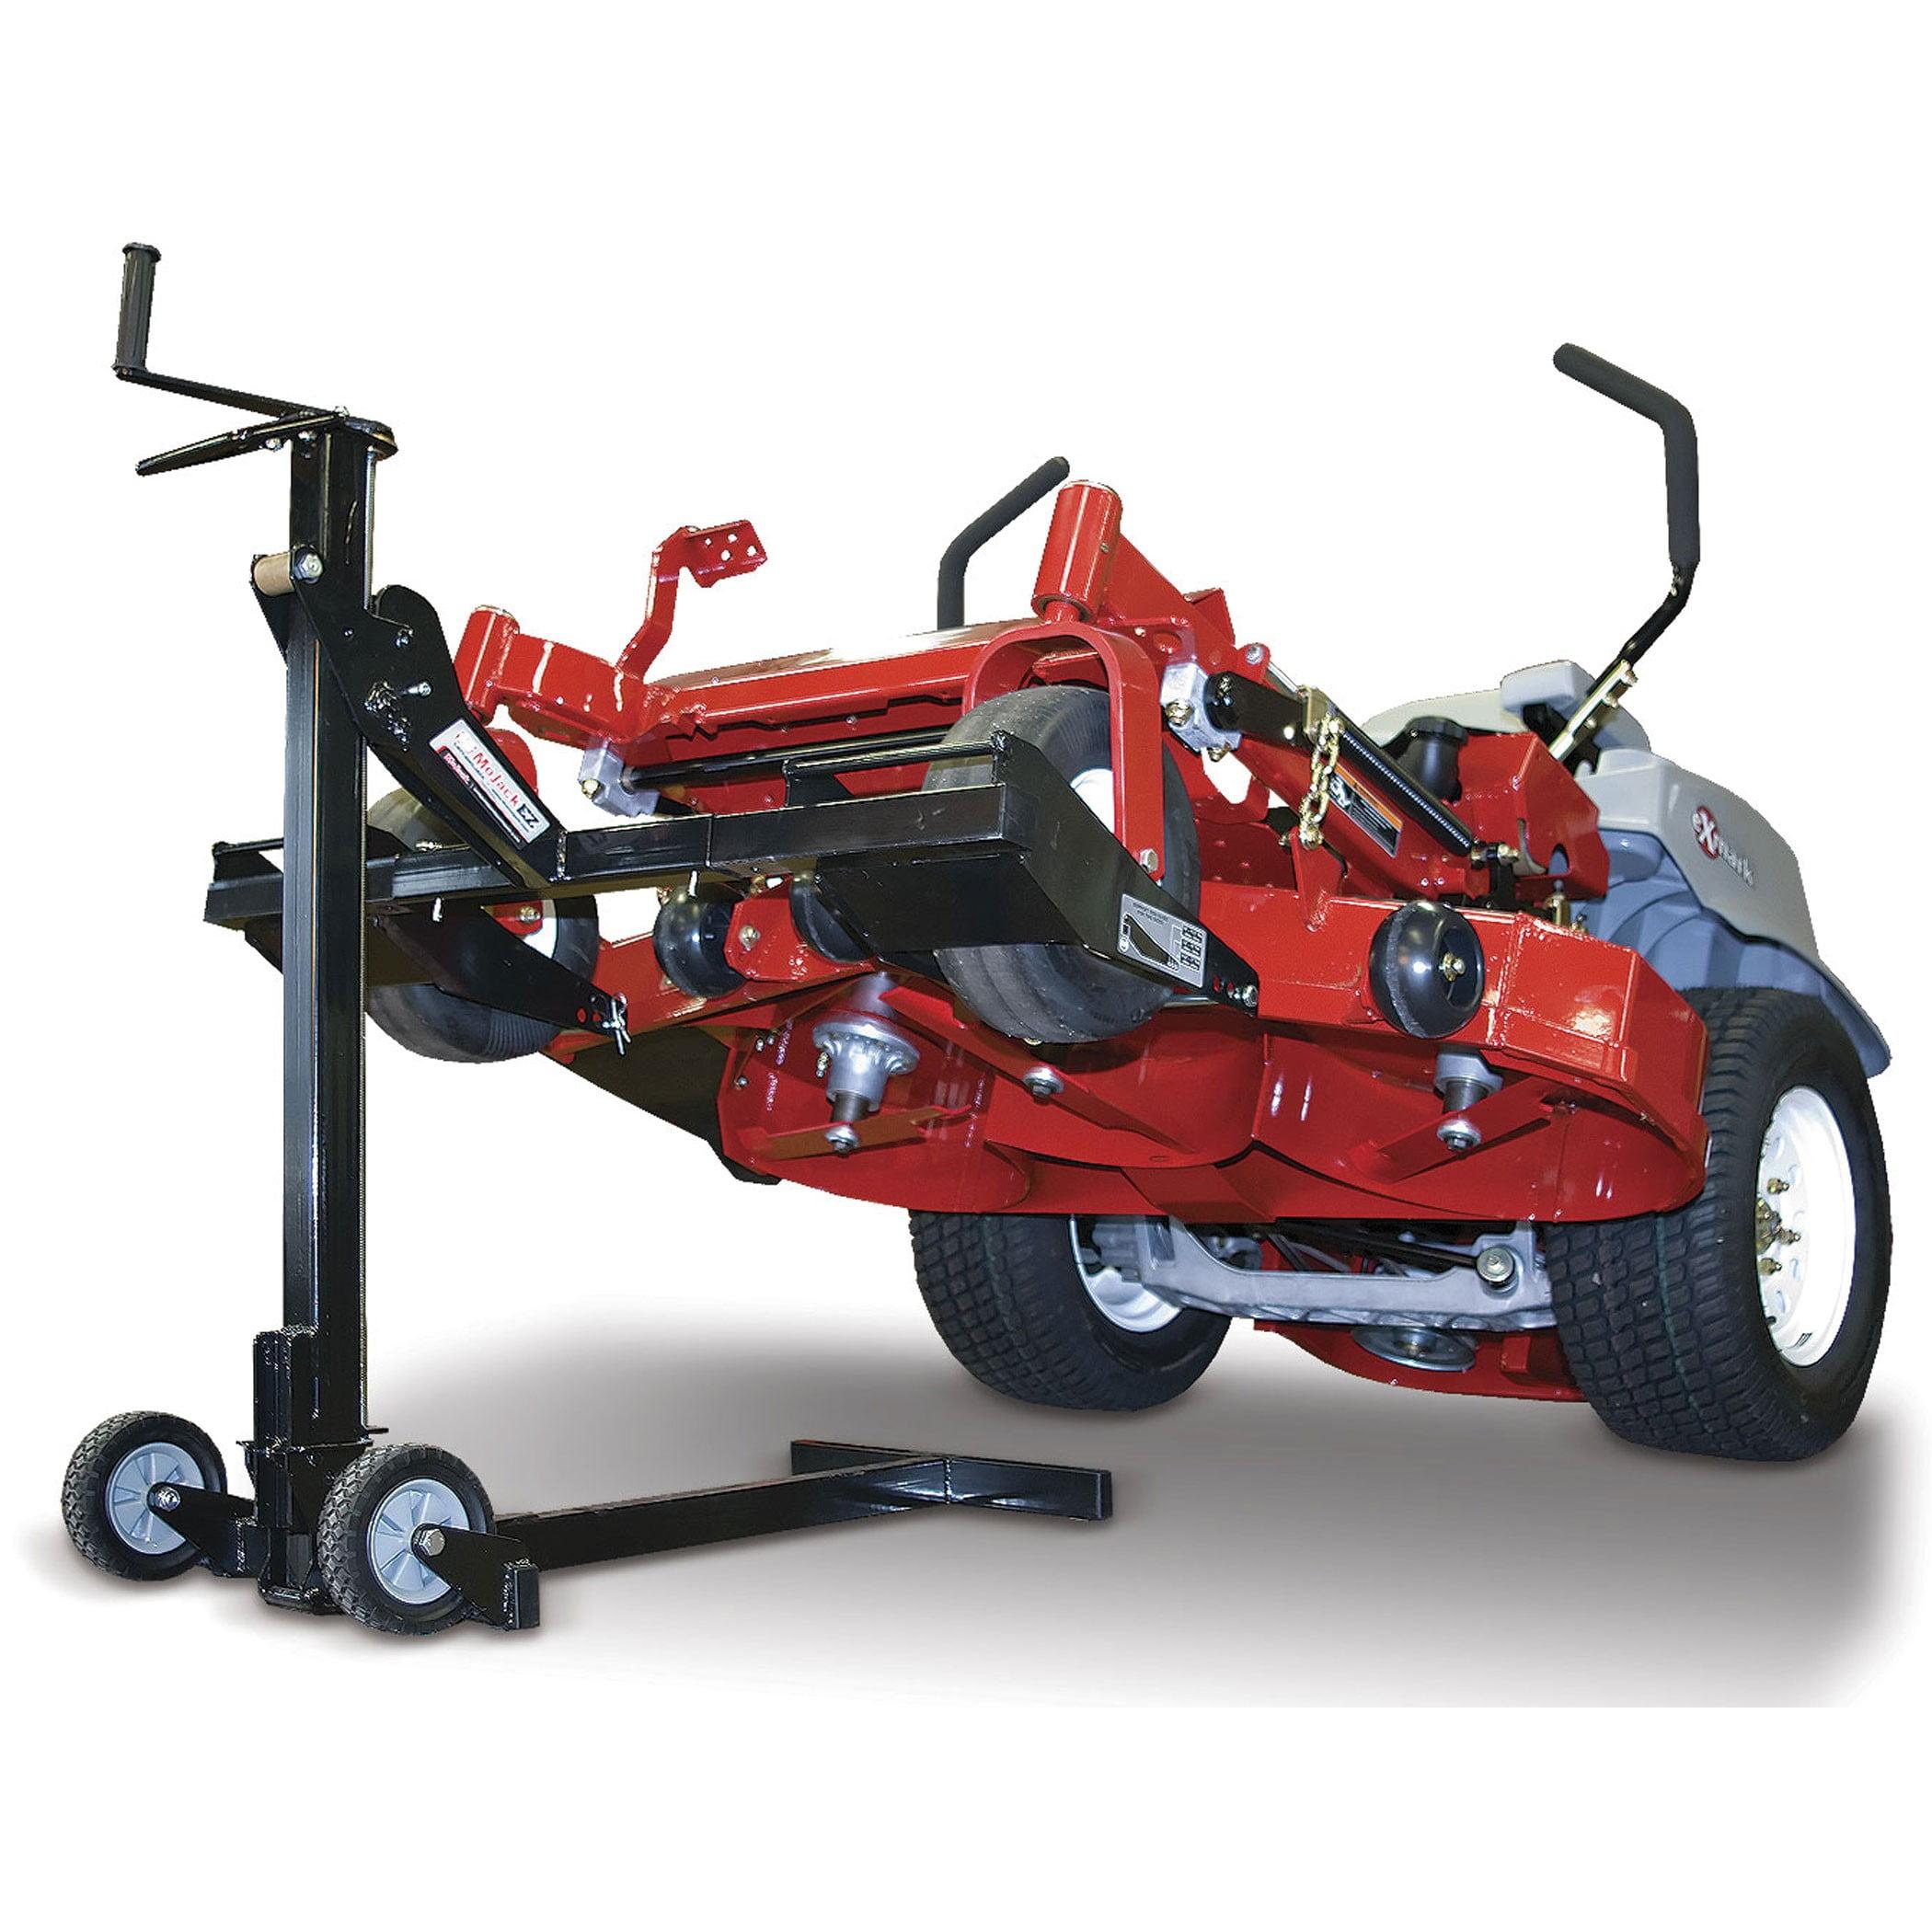 Lawn Mower Overhaul : Lawn mower repair maintenance